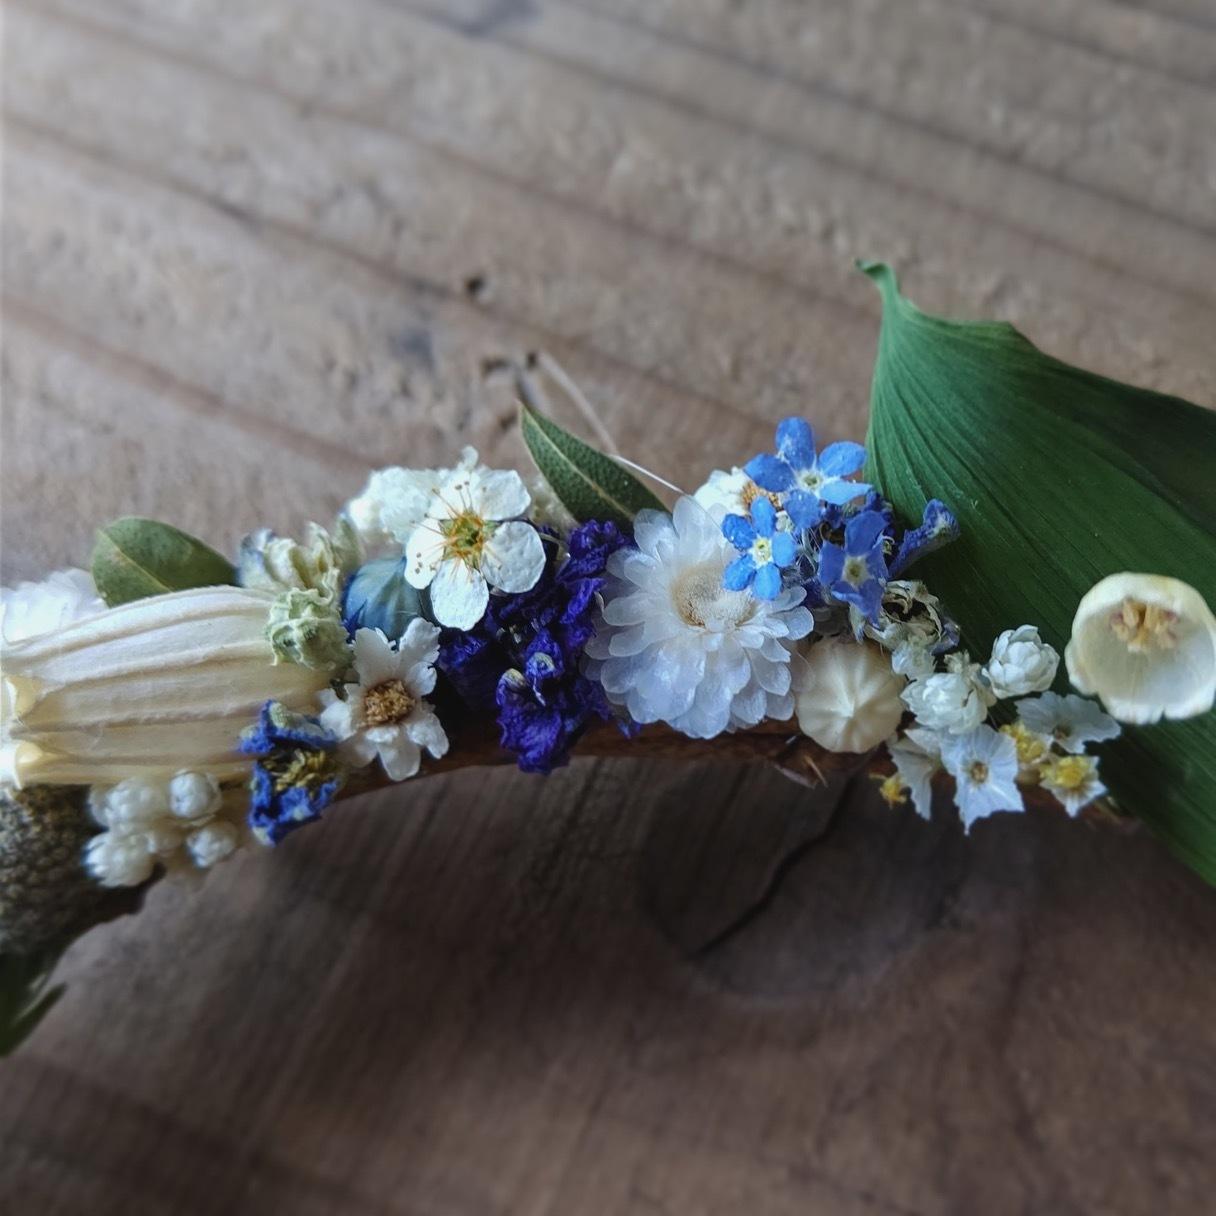 kokohanaさんのお部屋 💐アンデルセンの物語を花に寄せて_c0203401_22331740.jpeg